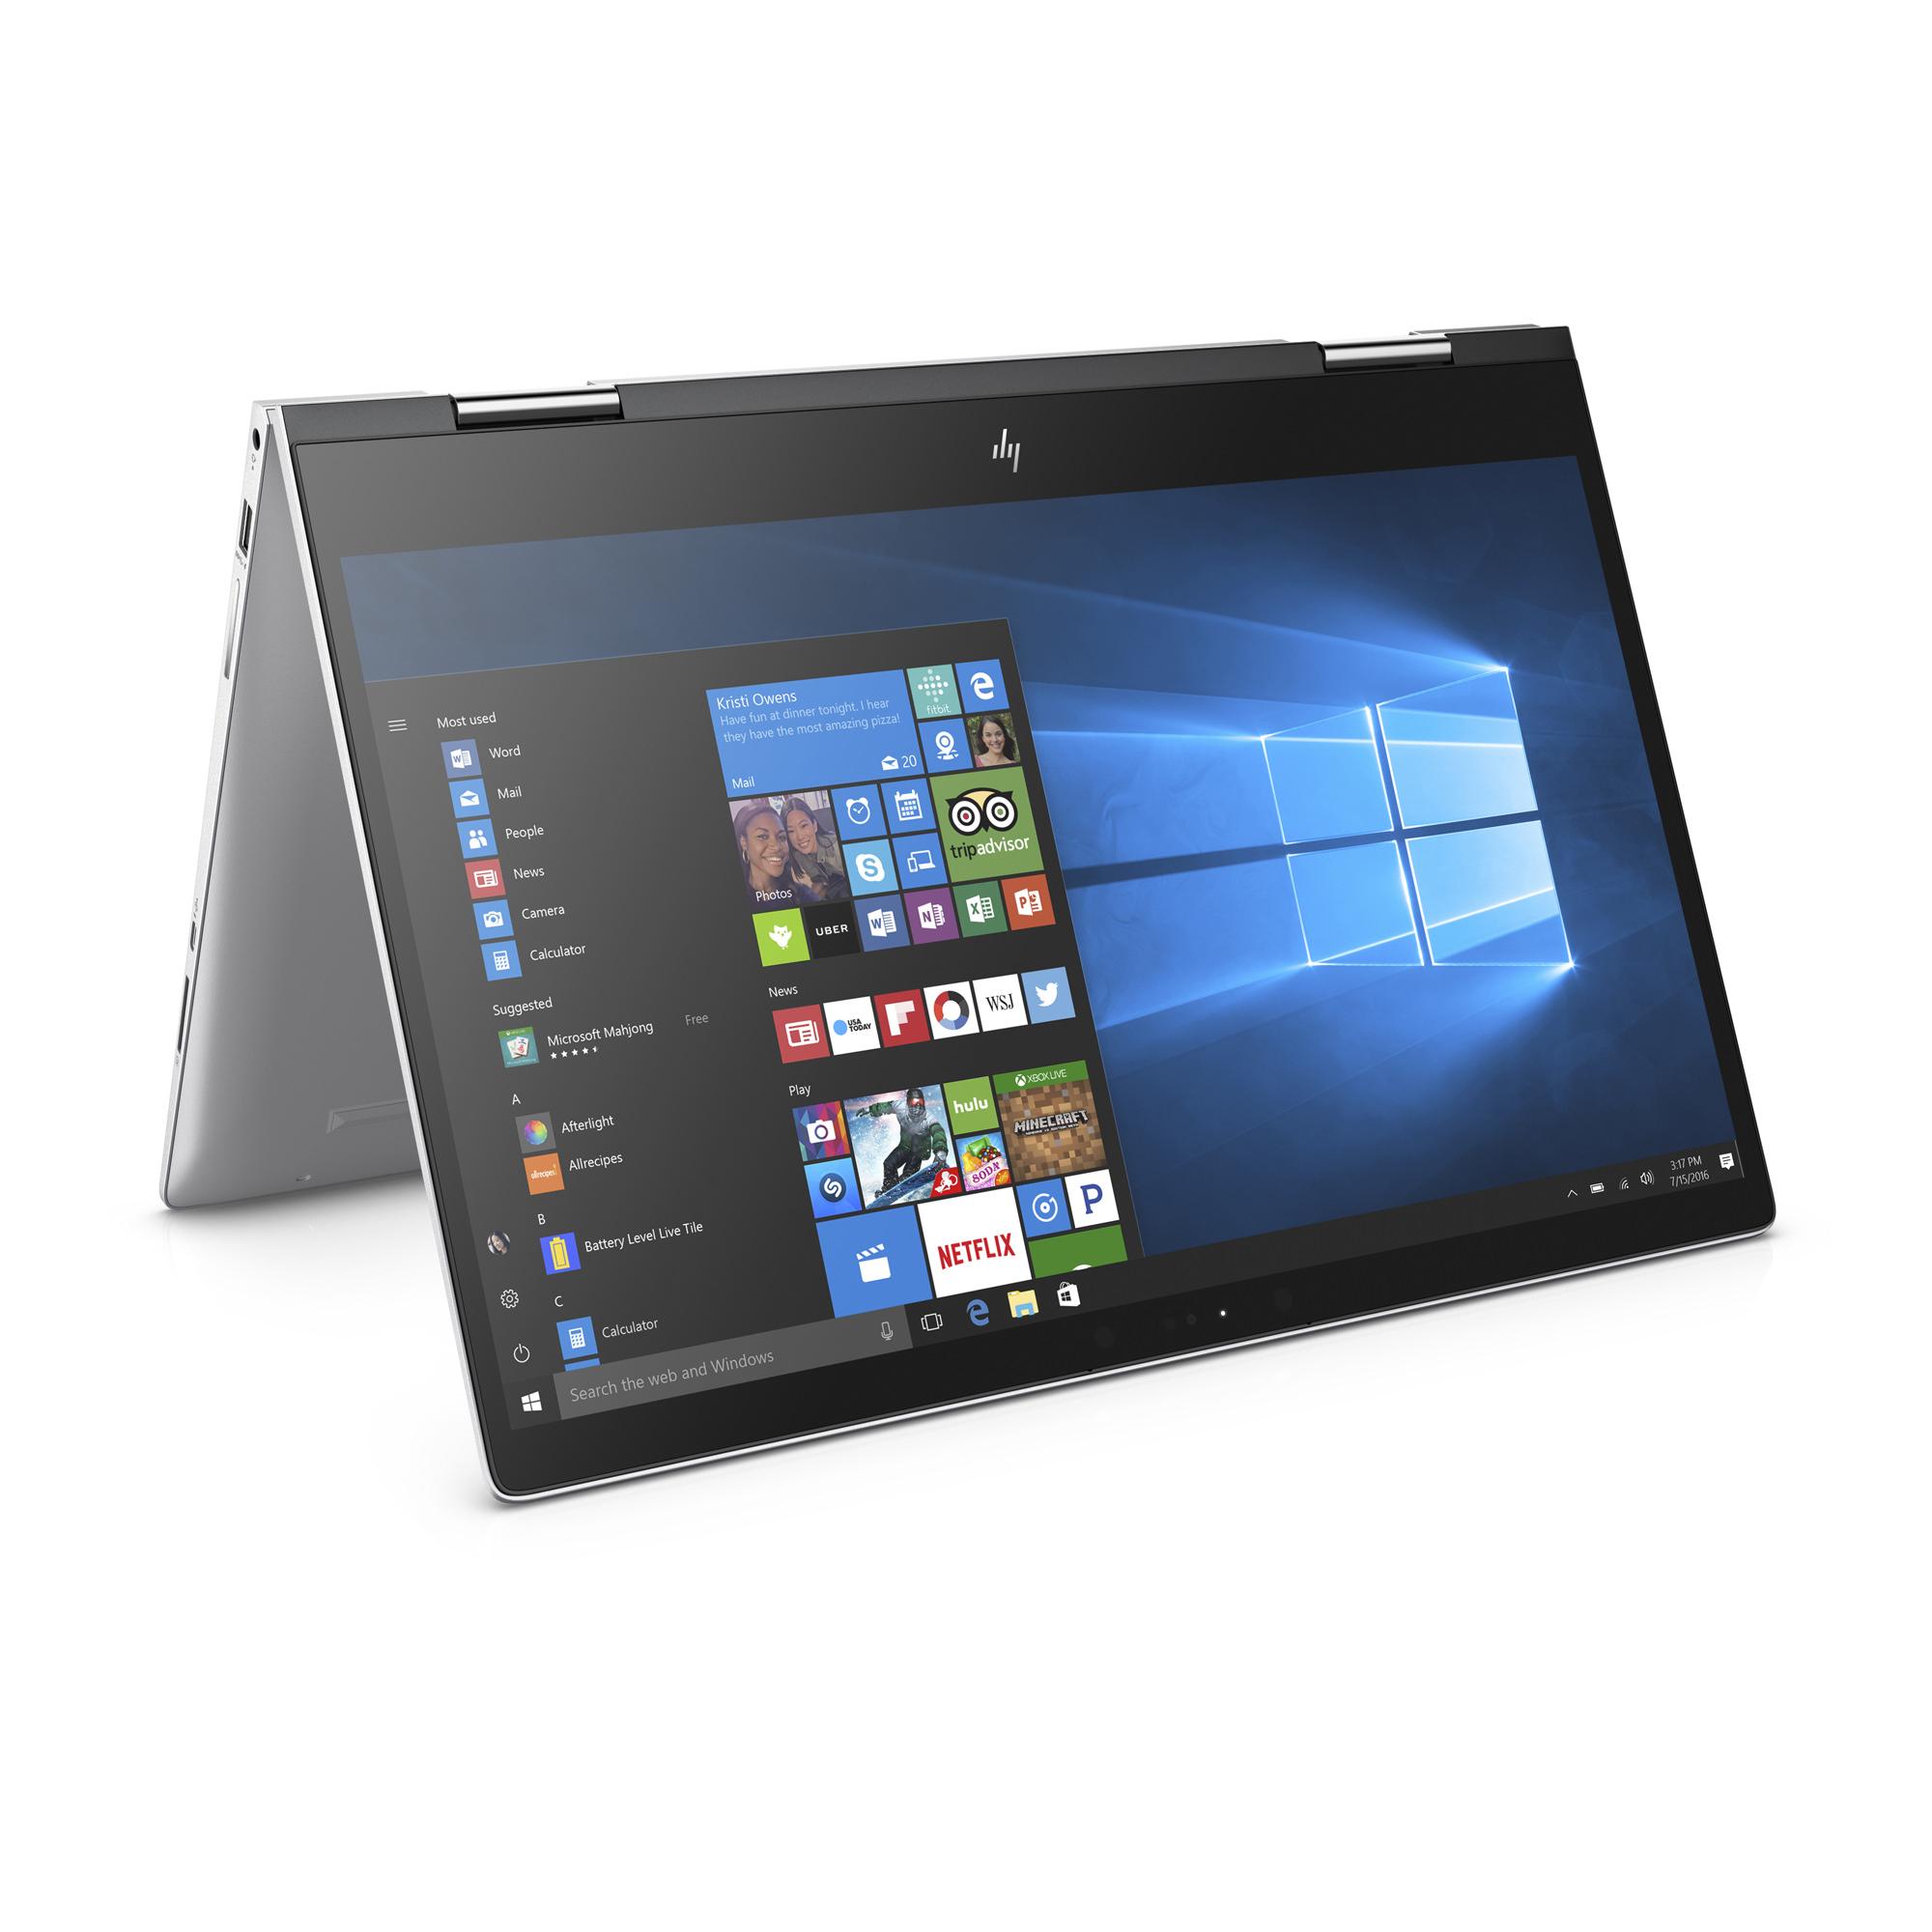 HP Envy 15-BP175NR Natural Silver 15.6 inch Touch Laptop, Windows 10, Core i7-8550U QC Processor, 8GB Memory, 1TB Hard Drive, UMA Graphics, Backlit Keyboard, Bang & Olufsen